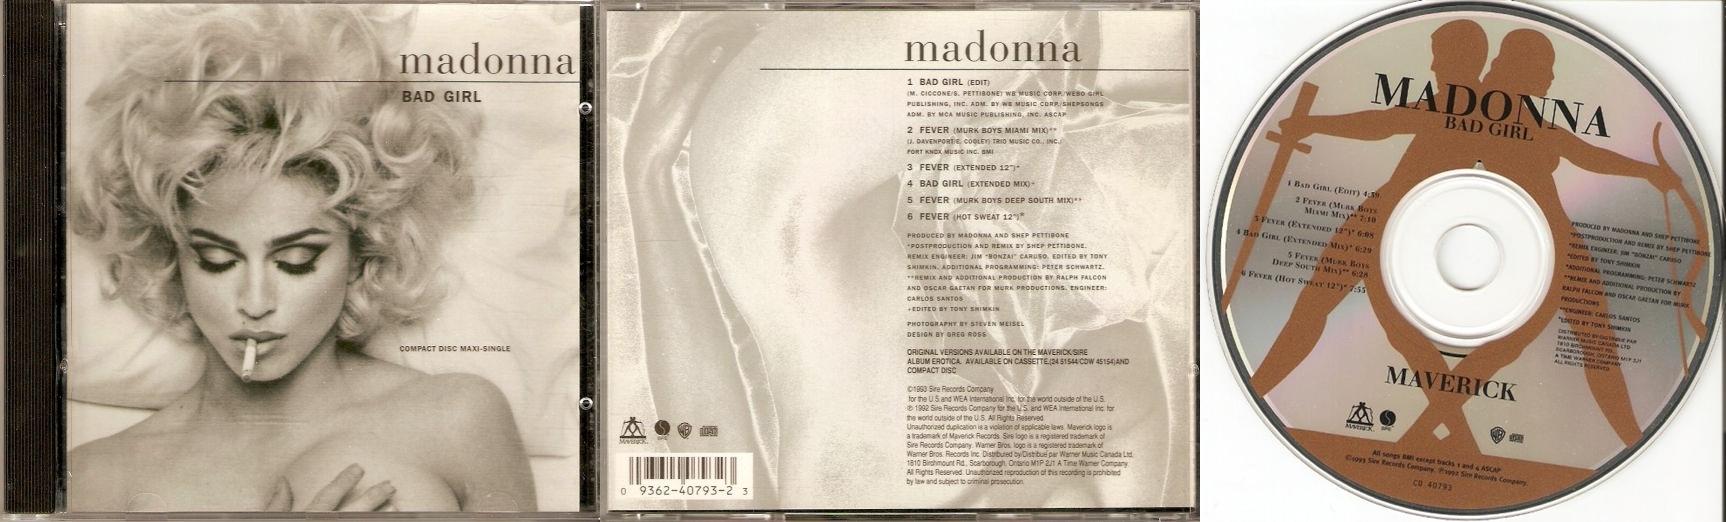 Madonna Erotica Single 65